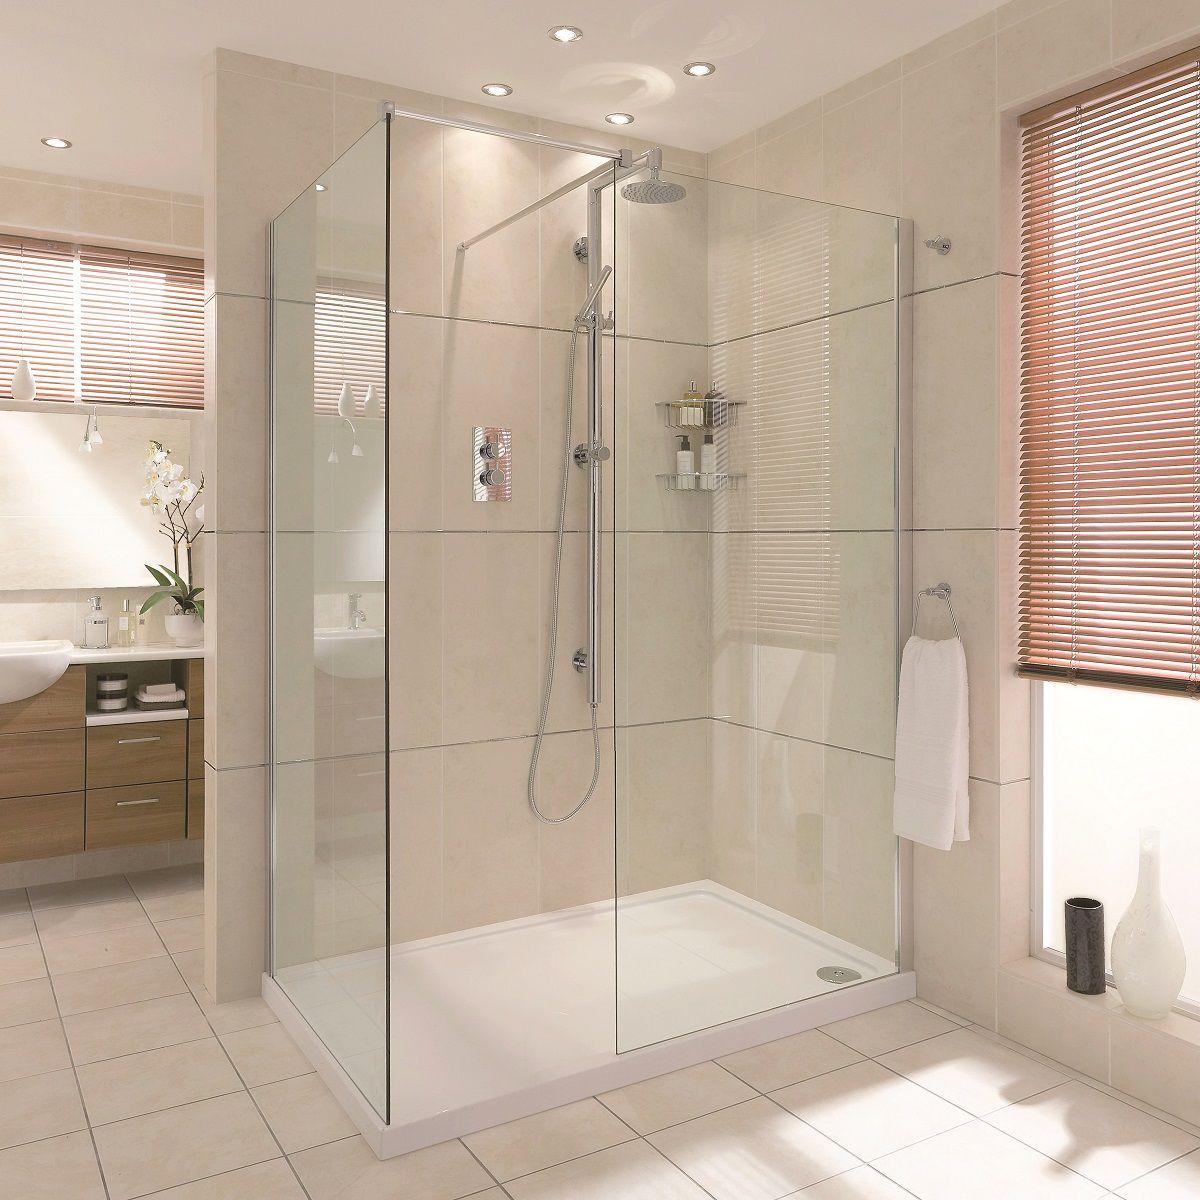 Aqata Spectra Sp405 Walk In Corner Shower Uk Bathrooms